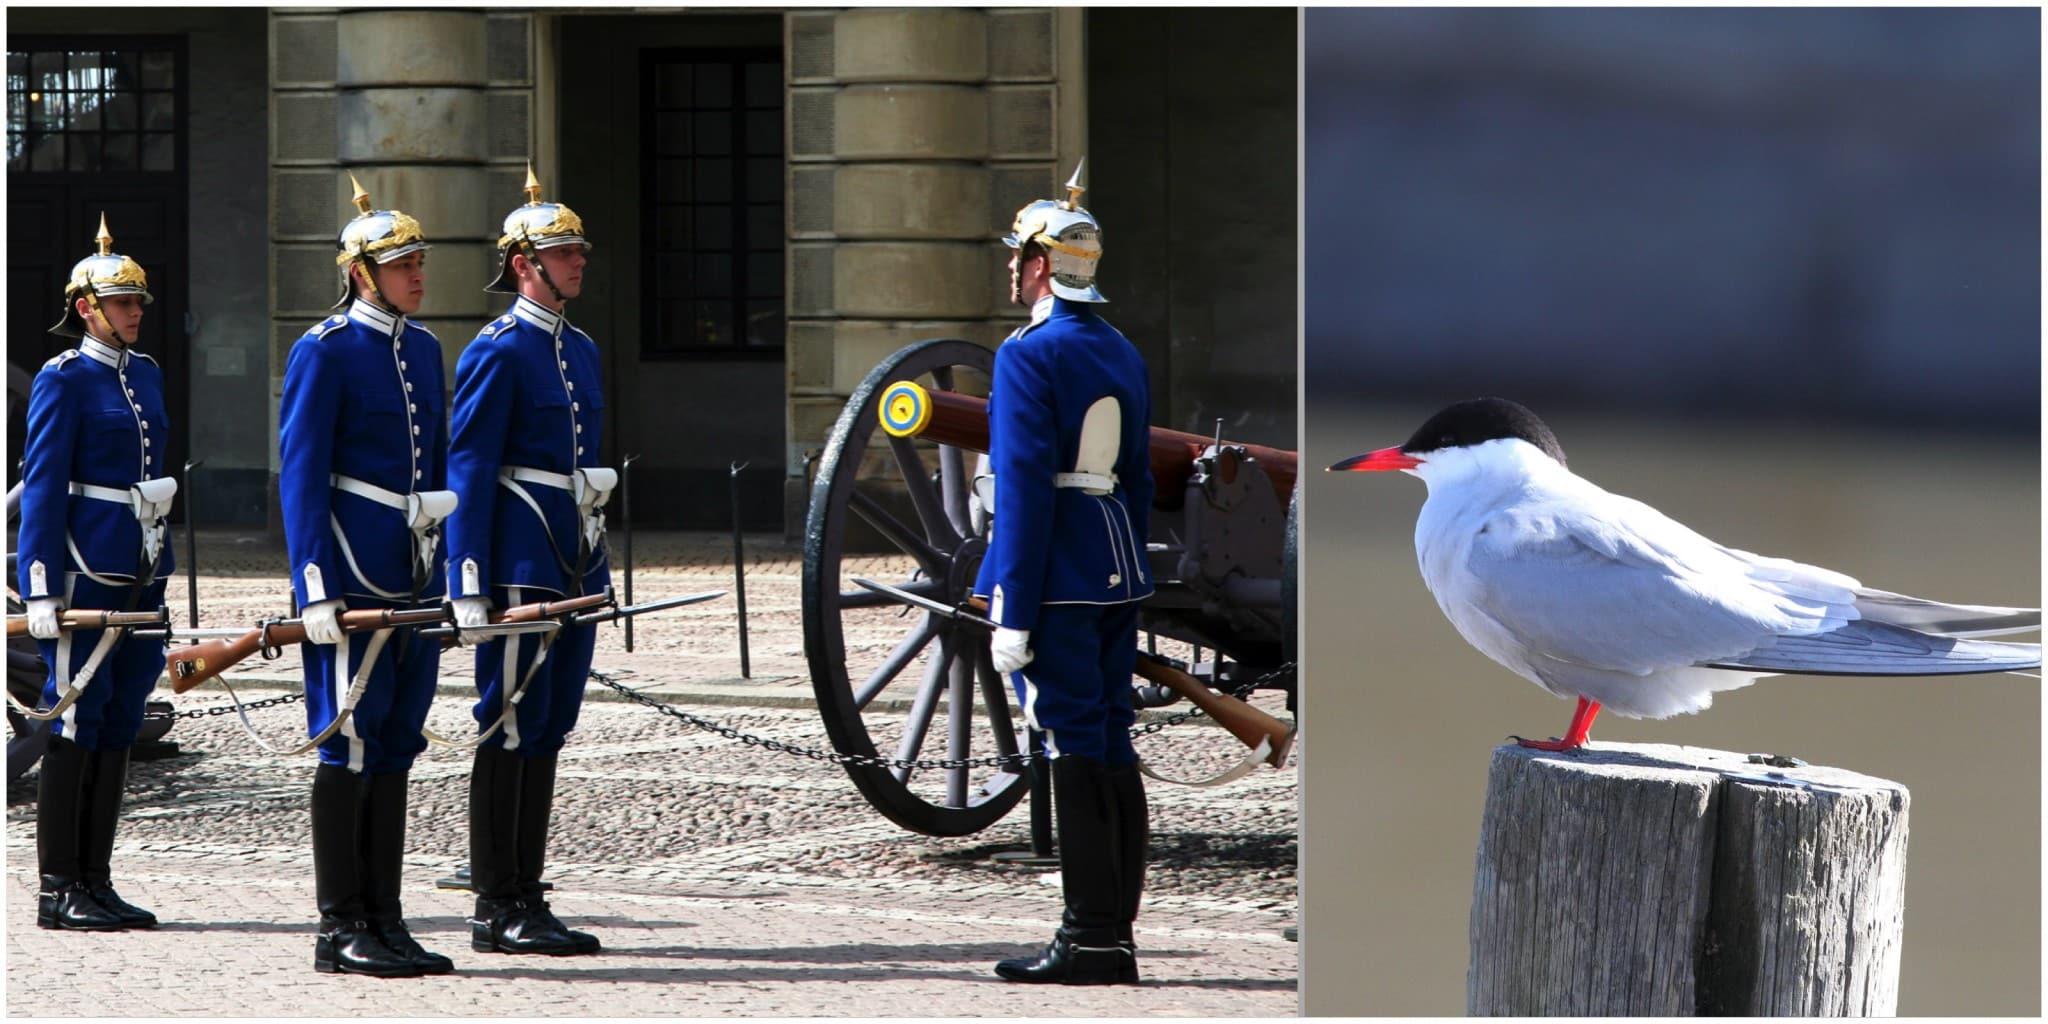 Foto: Mostphotos samt Niklas Liljebäck (fisktärna)